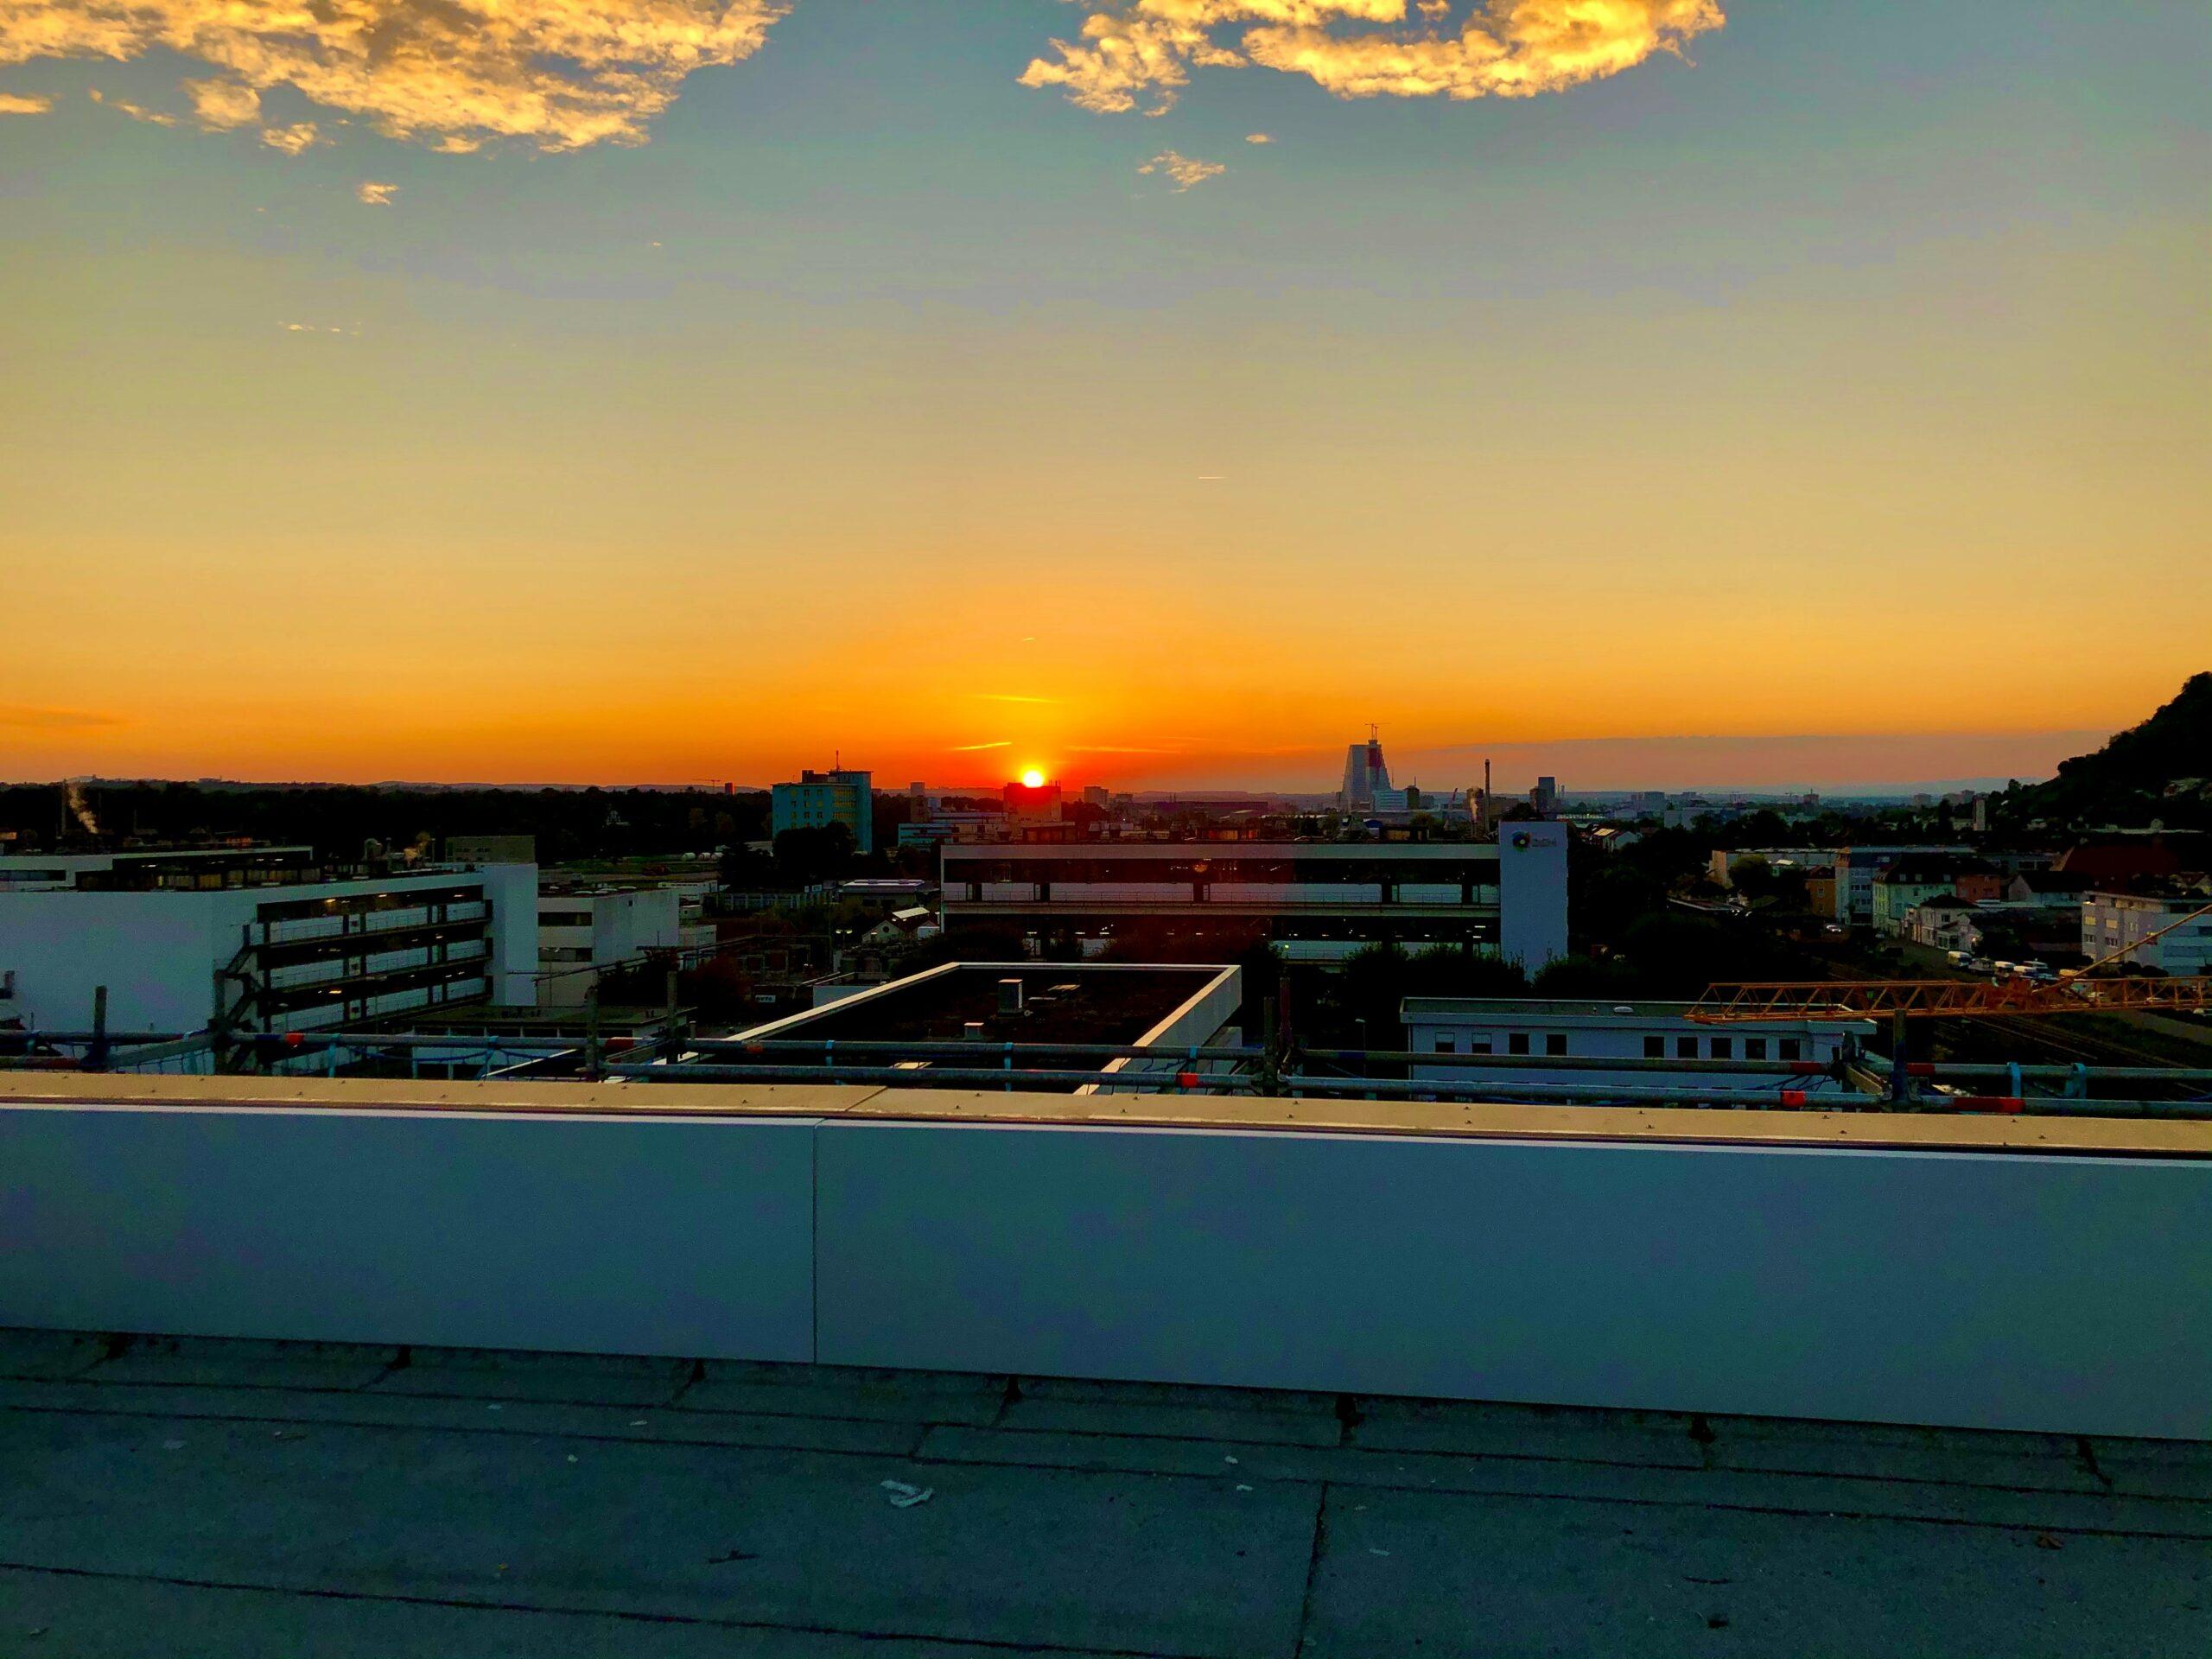 Sonnenuntergang auf unserem Dach